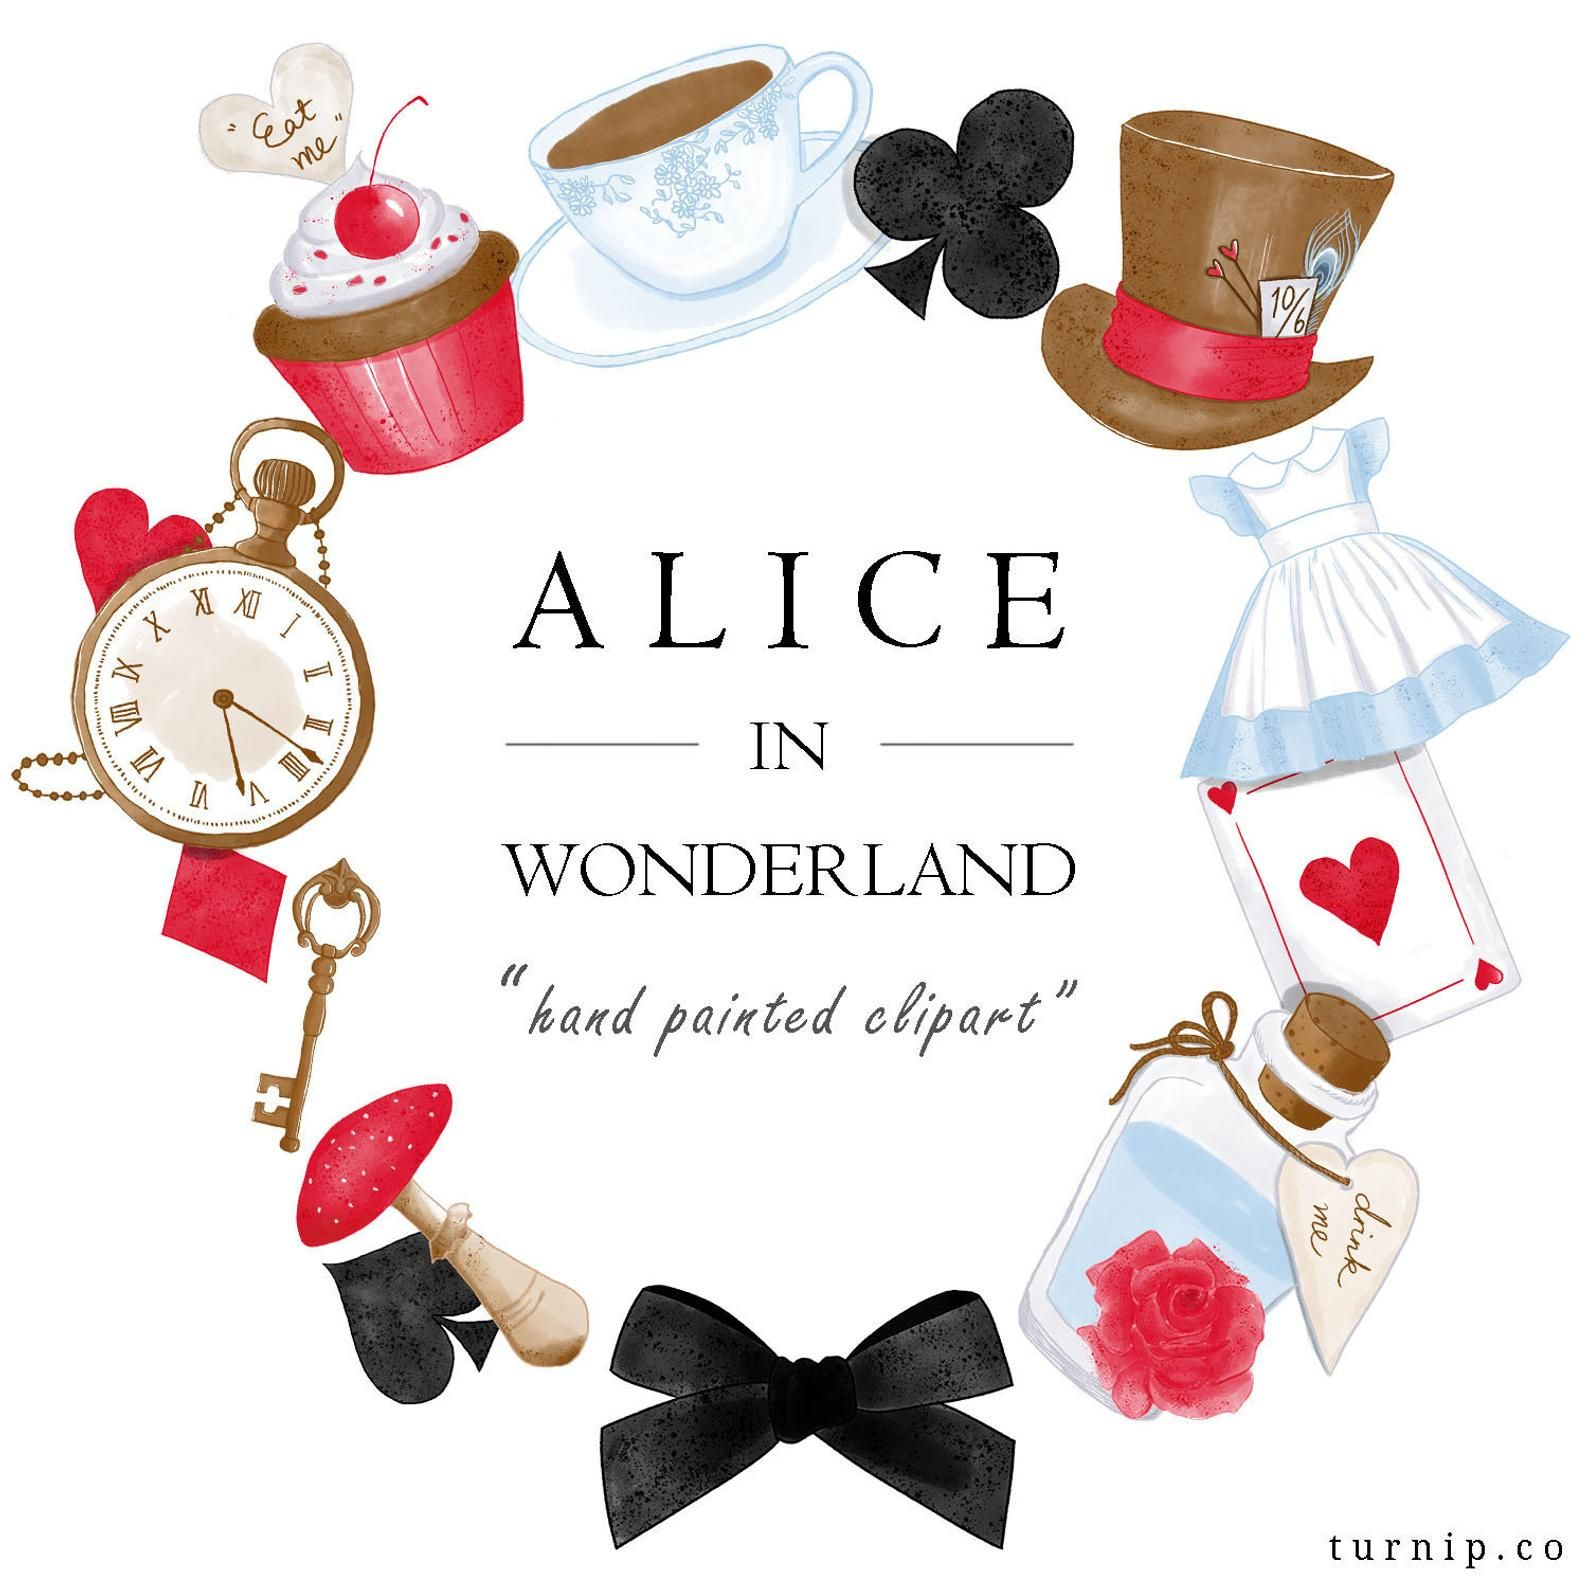 Alice S Adventures In Wonderland Caterpillar Cheshire Cat White Rabbit Alice In Wonderland Cartoon Alice In Wonderland Silhouette Alice In Wonderland Clipart